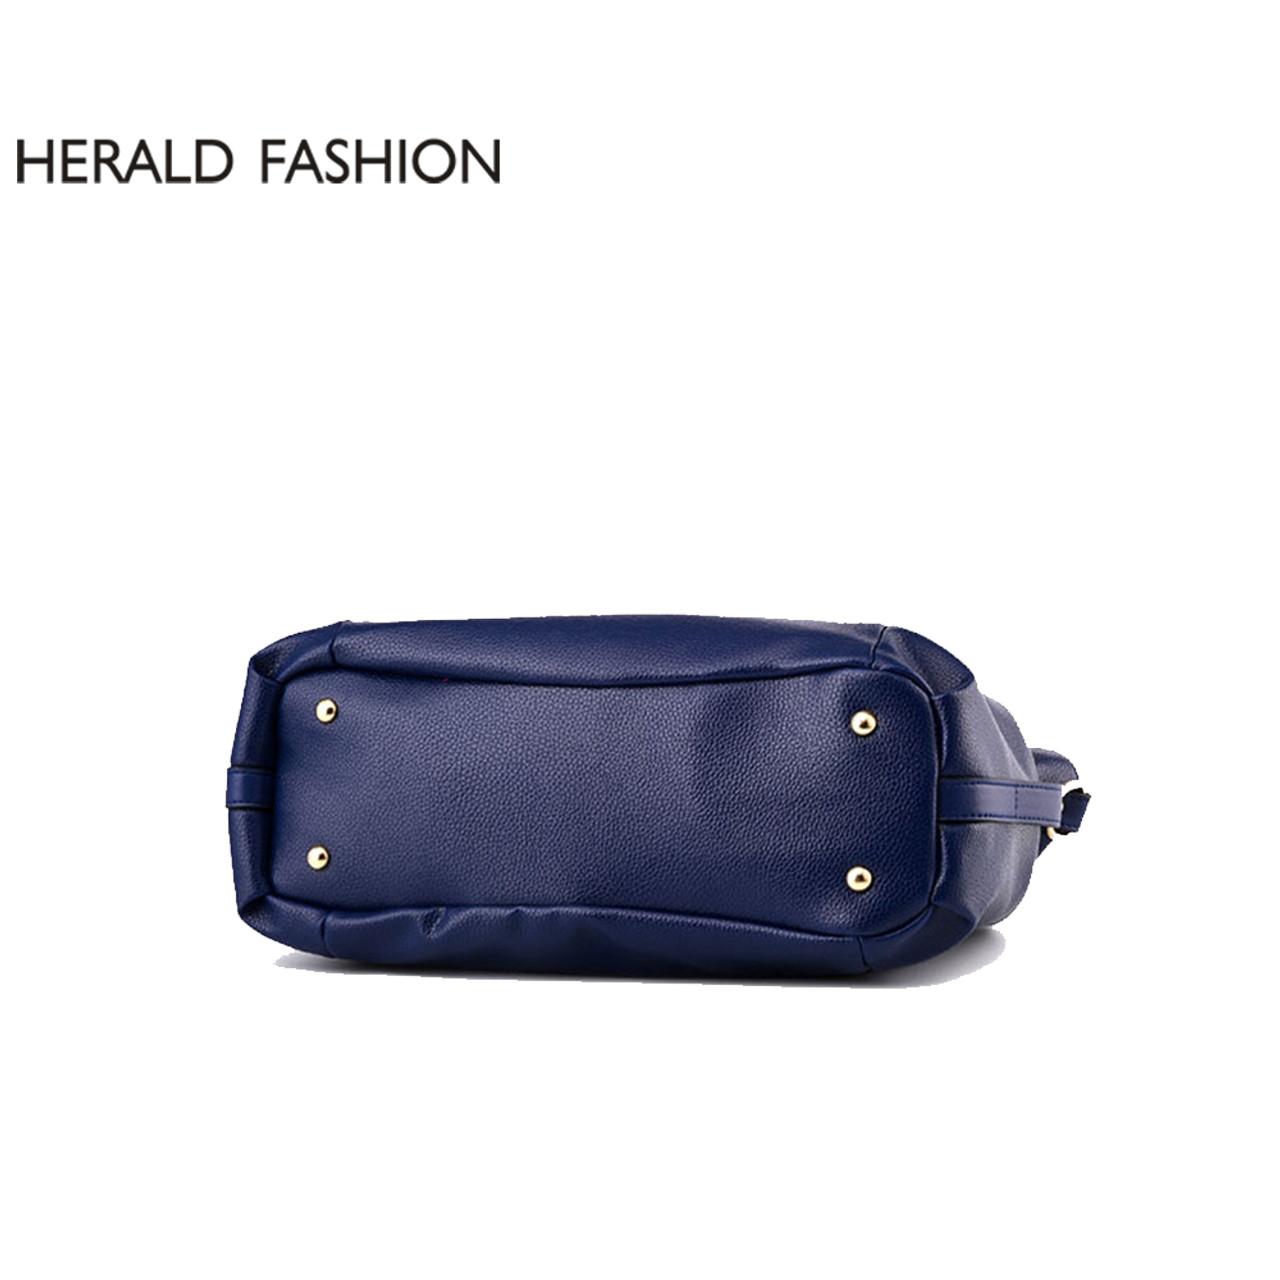 fea4ea8e9e5 ... Herald Fashion Designer Women Handbag Female PU Leather Bags Handbags  Ladies Portable Shoulder Bag Office Ladies ...